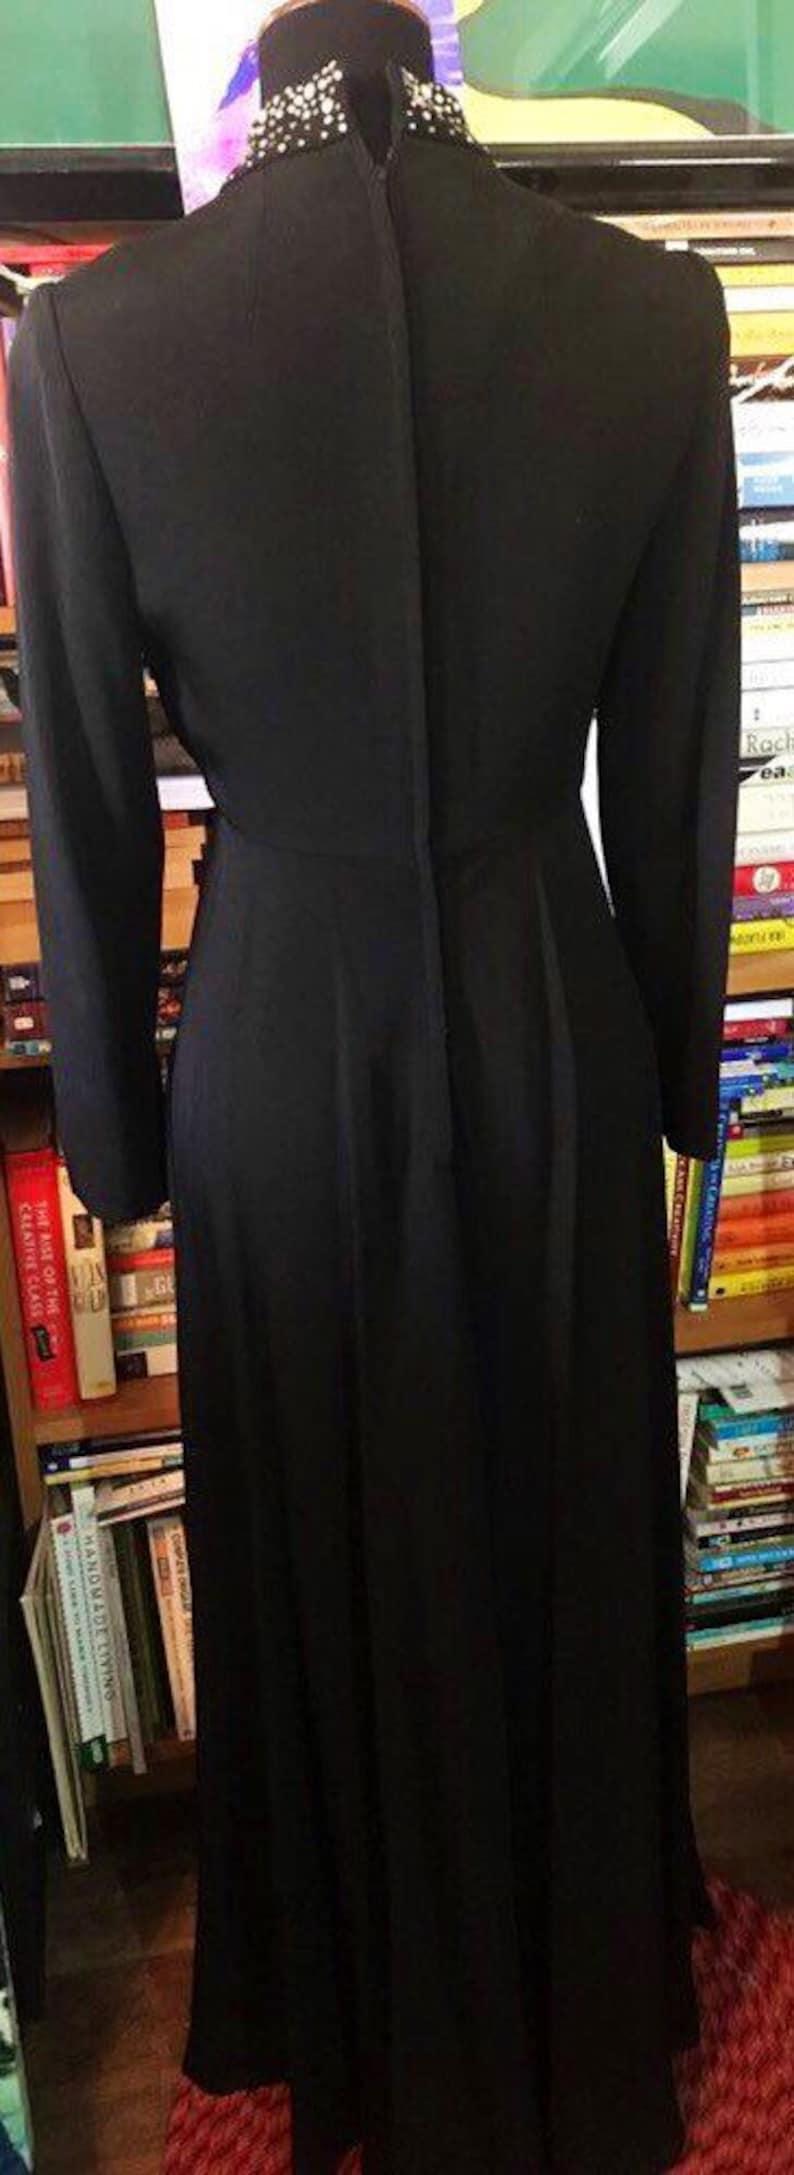 1960/'s Rhinestone Collar Long Sleeve EveningFormal Dress by Jane Justin for Don Sophisticates